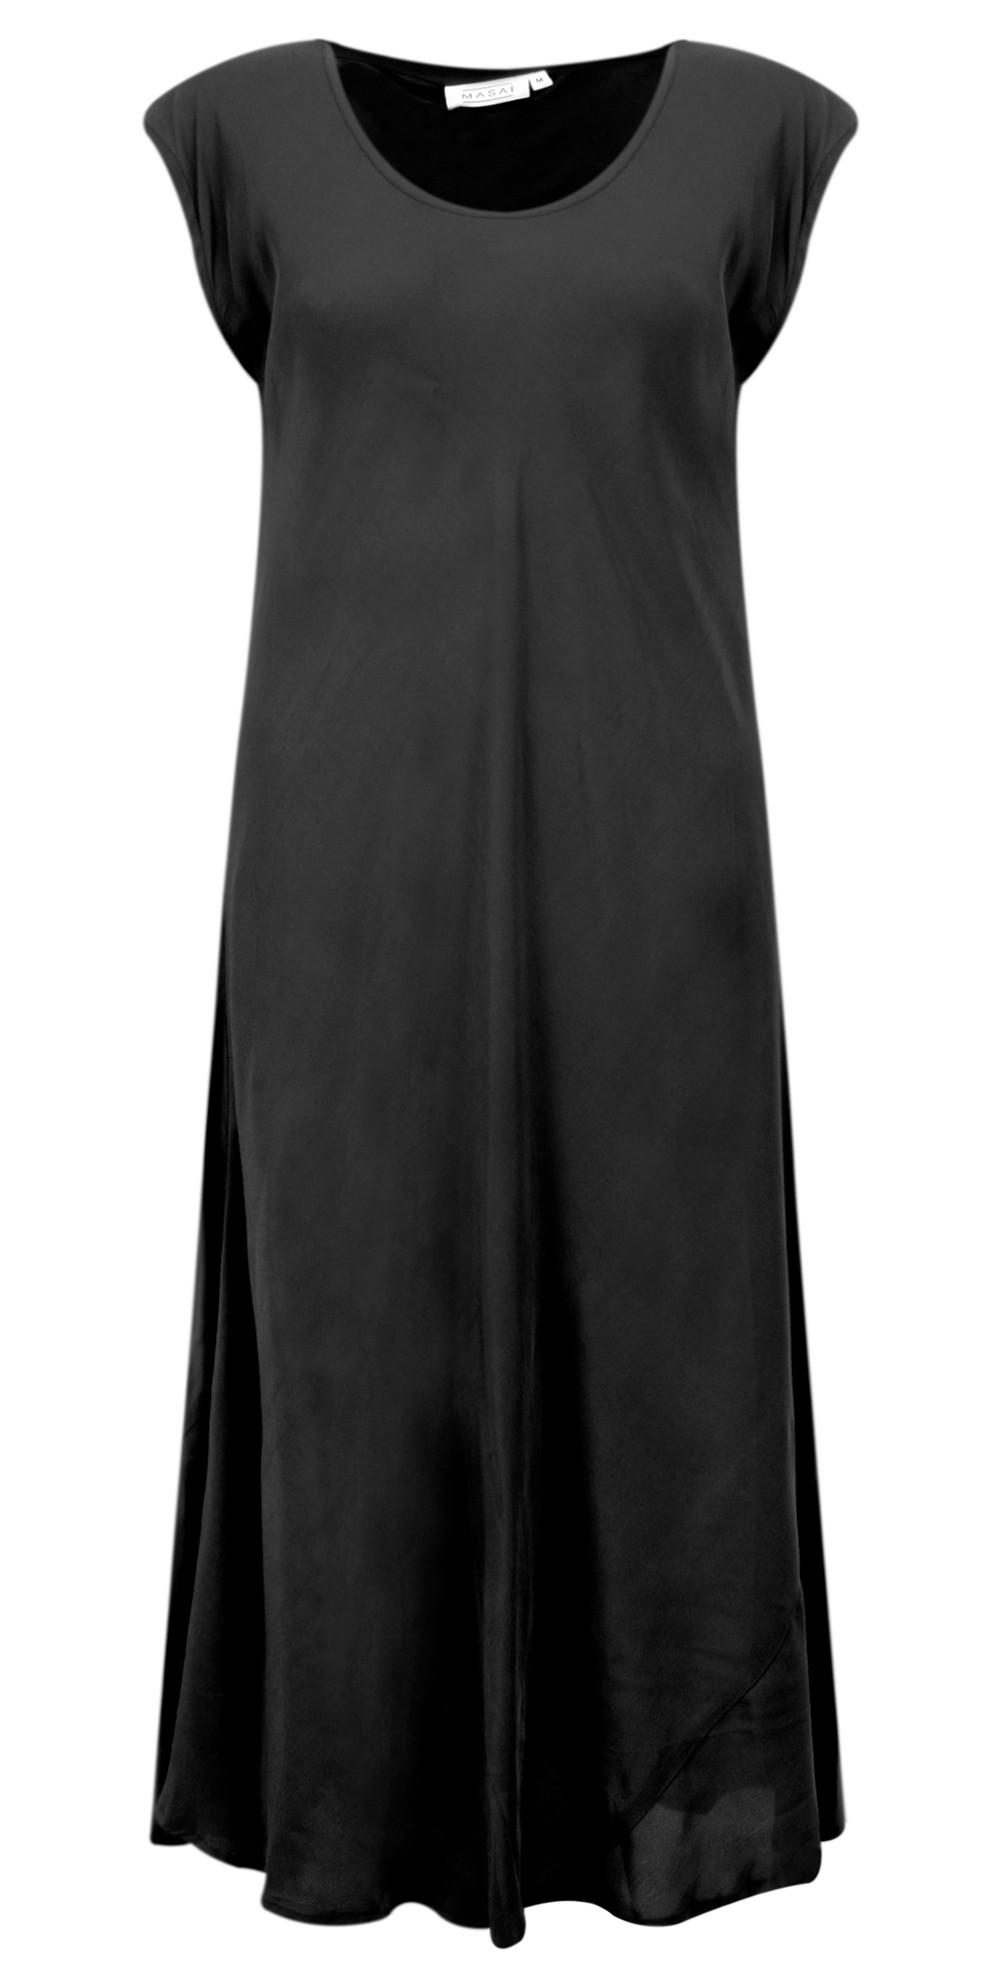 Unni Dress main image